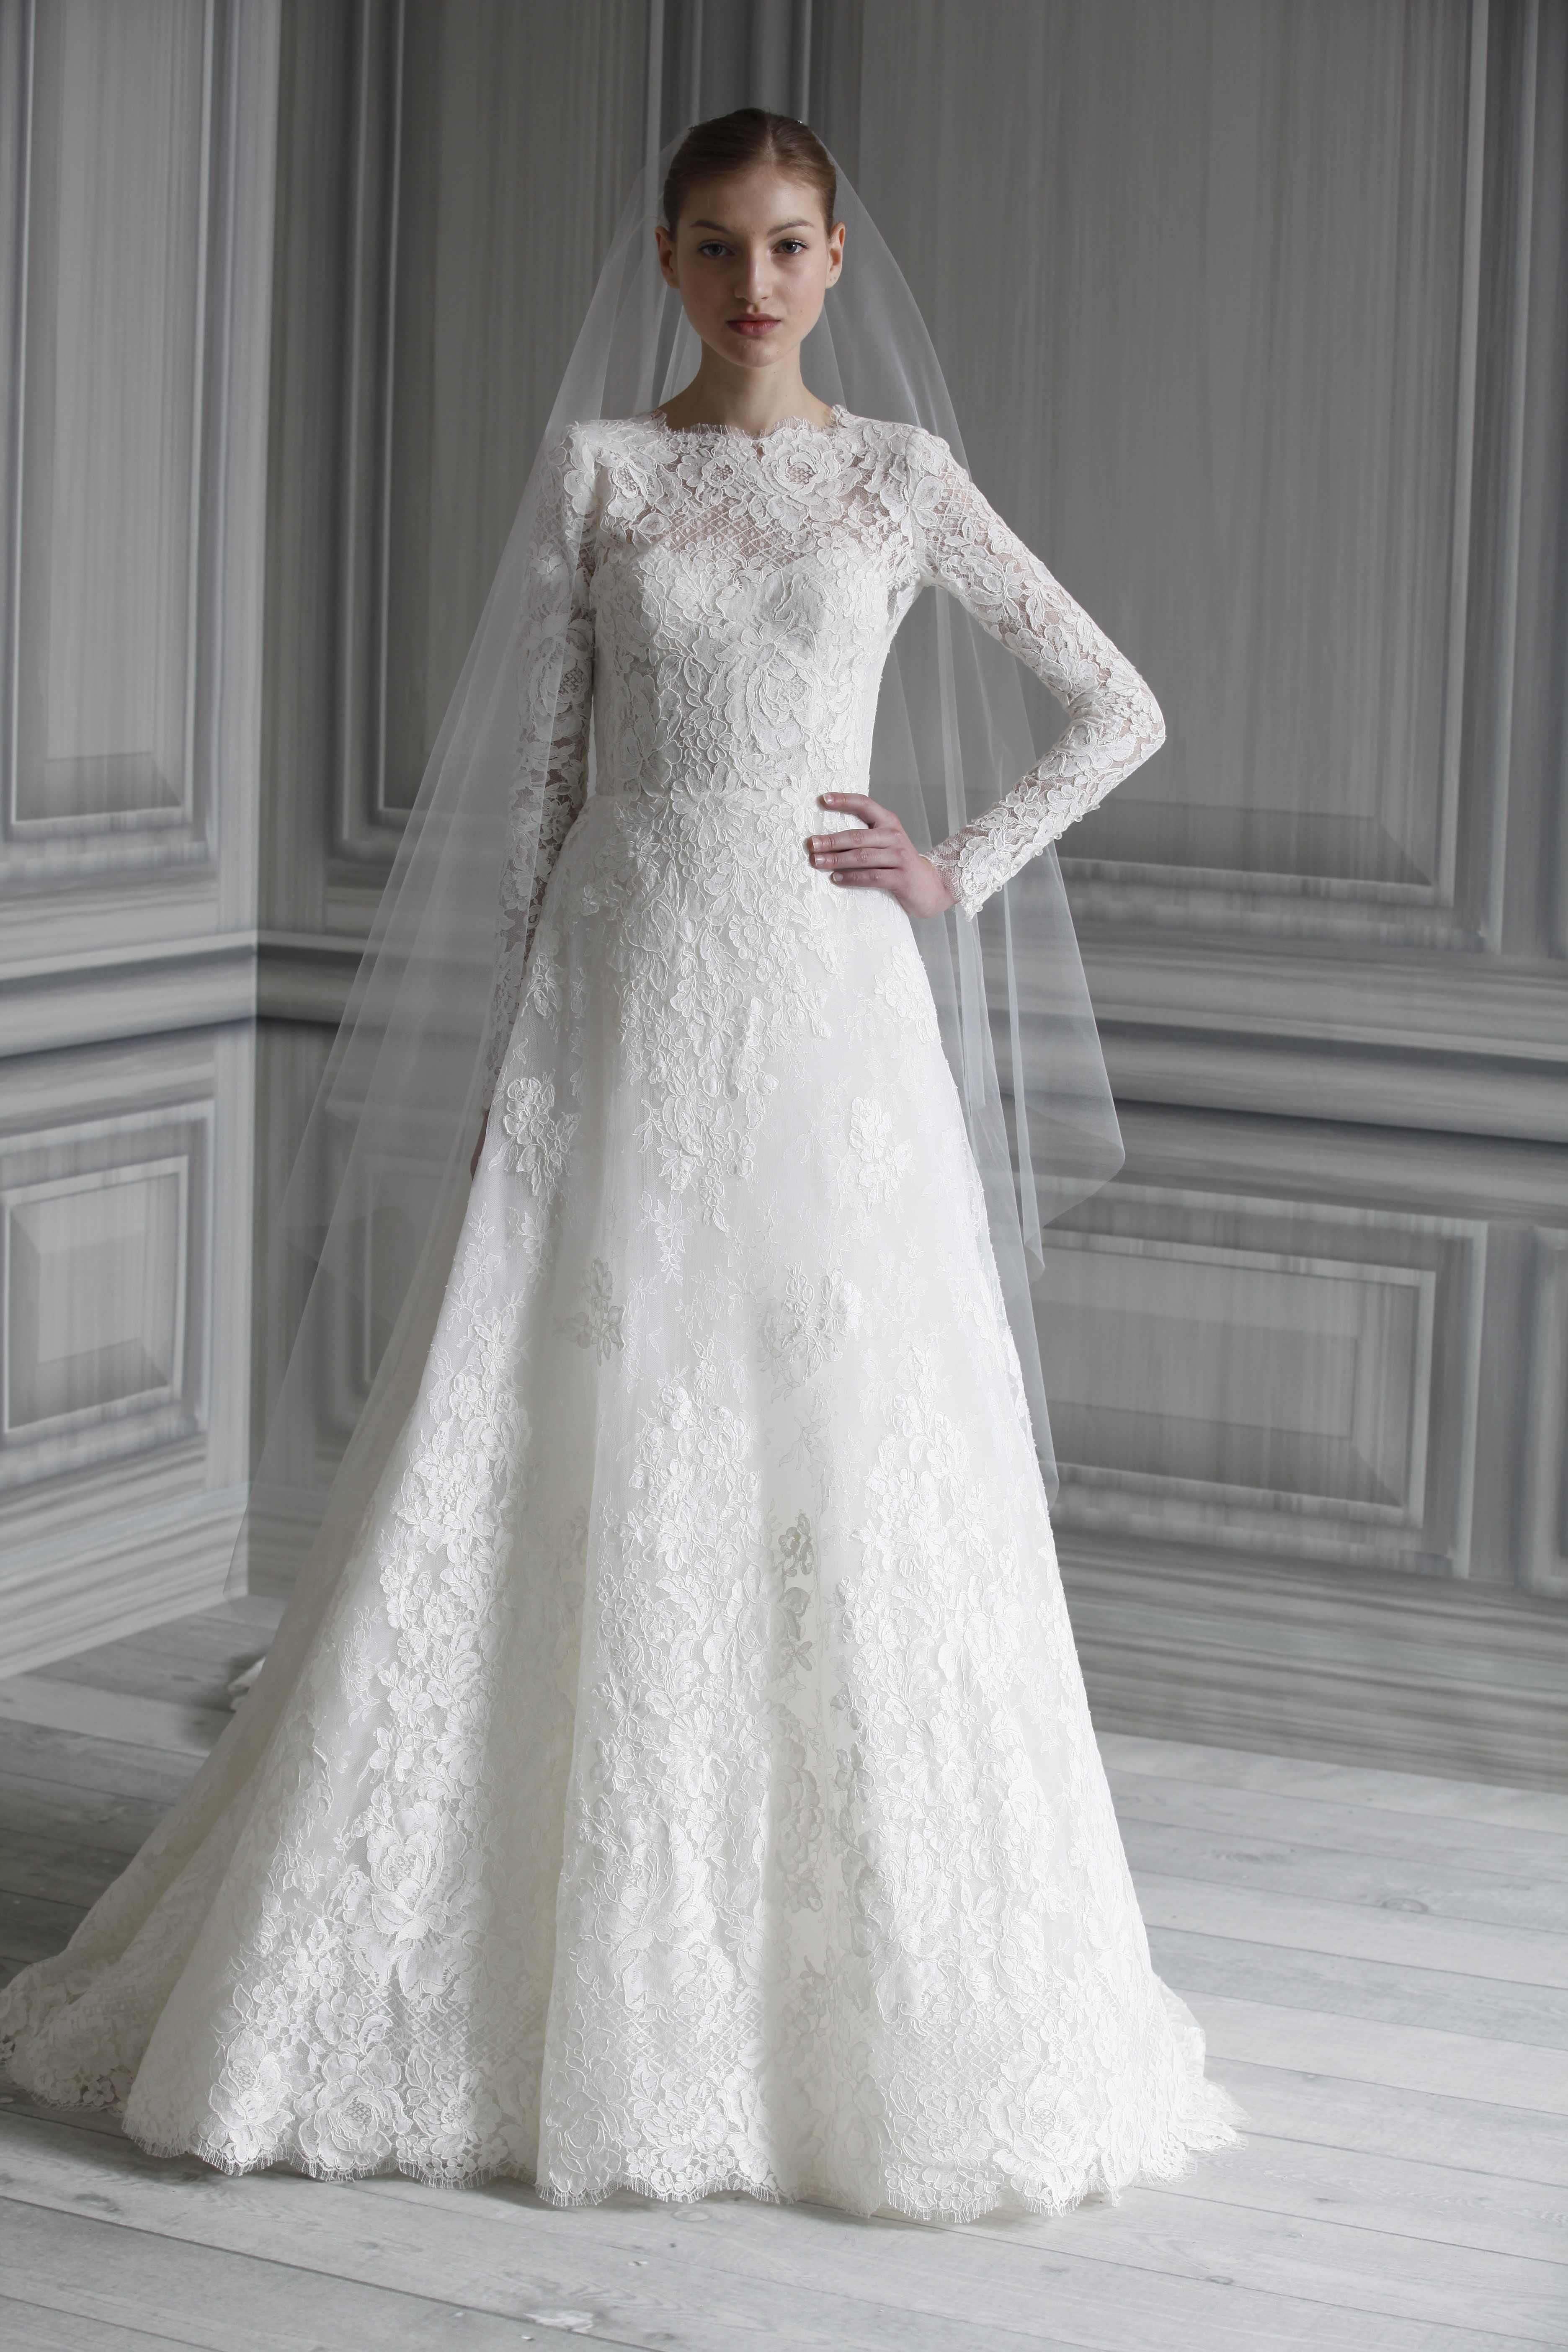 top long sleeved wedding dresses sleeved wedding dresses 20 of The Most Stunning Long Sleeve Wedding Dresses Chic Vintage Brides